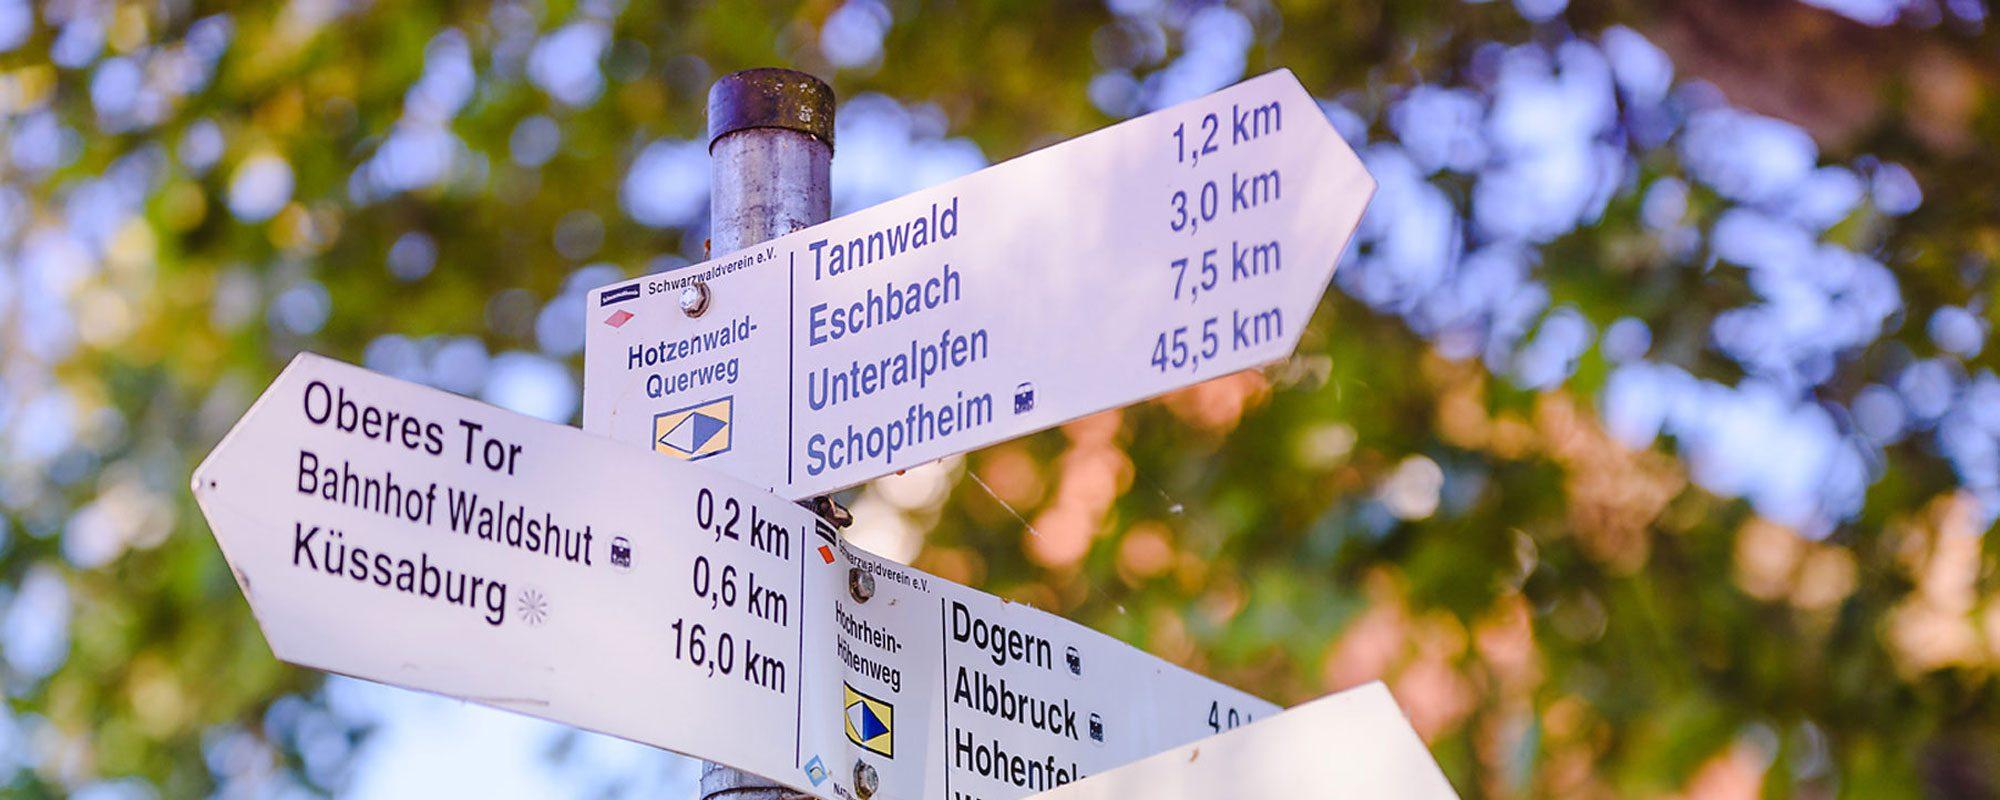 Ausflugsziele Waldshut